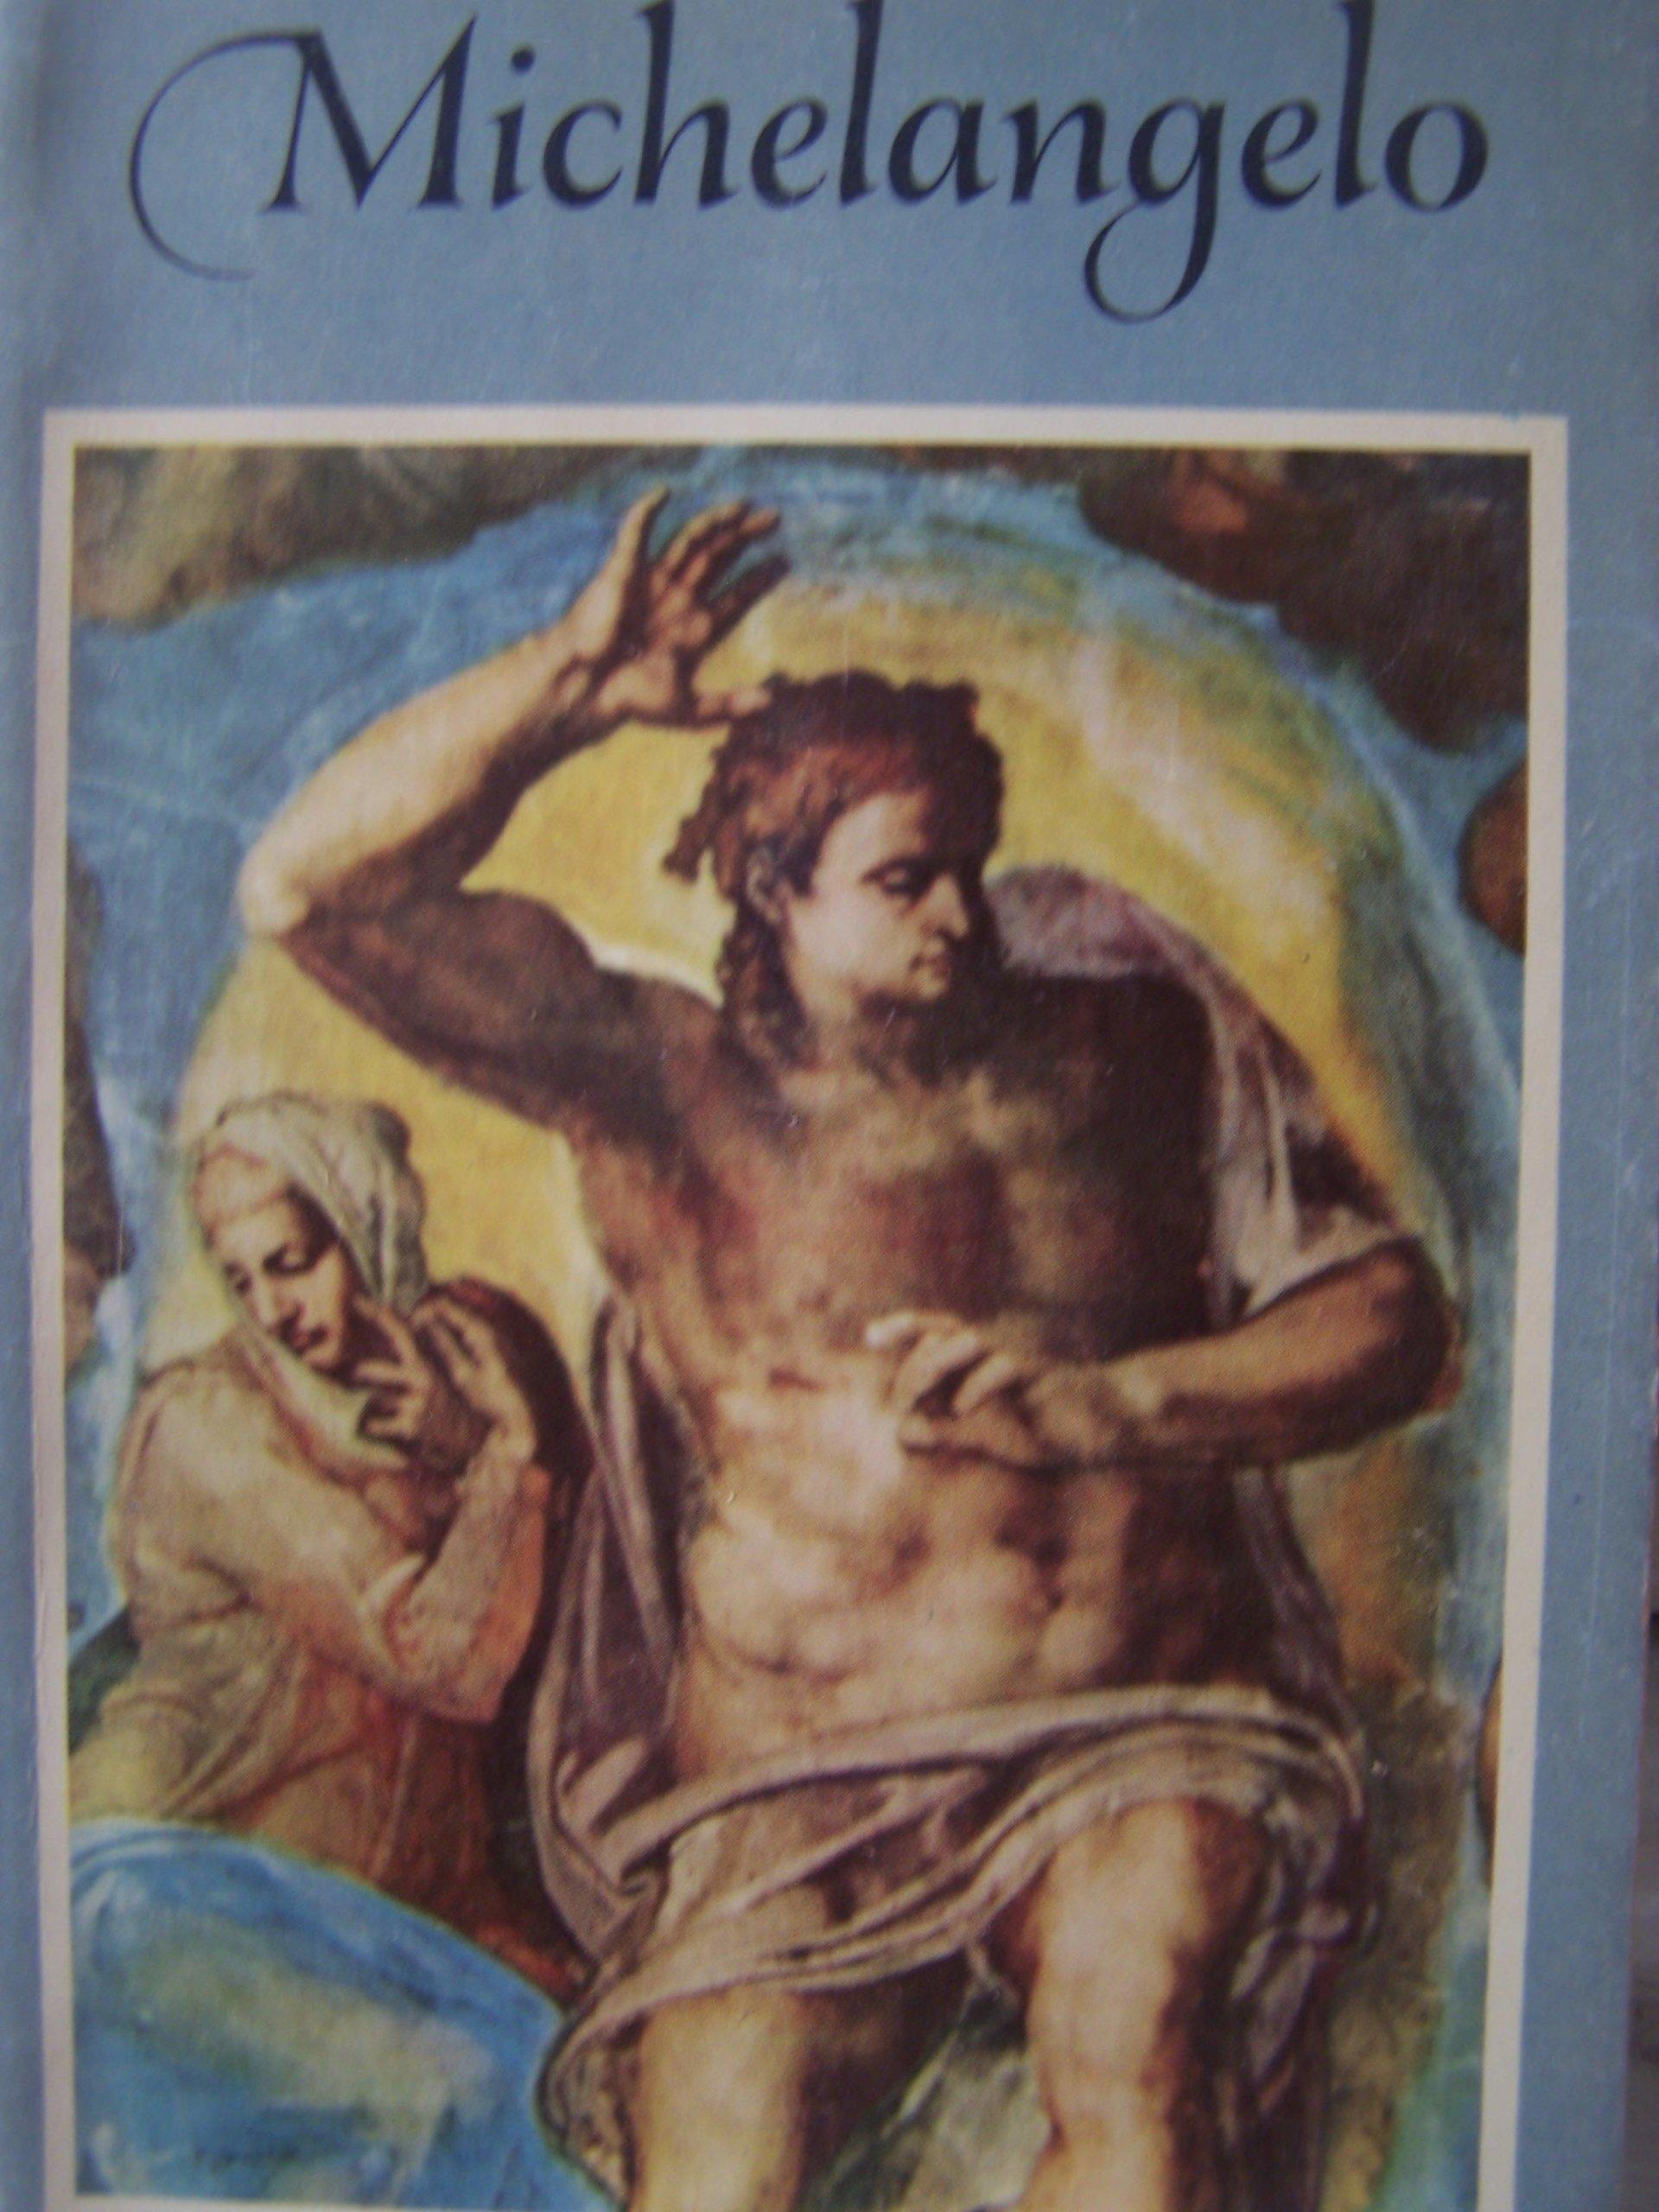 michelangelo tthe pocket library of great art